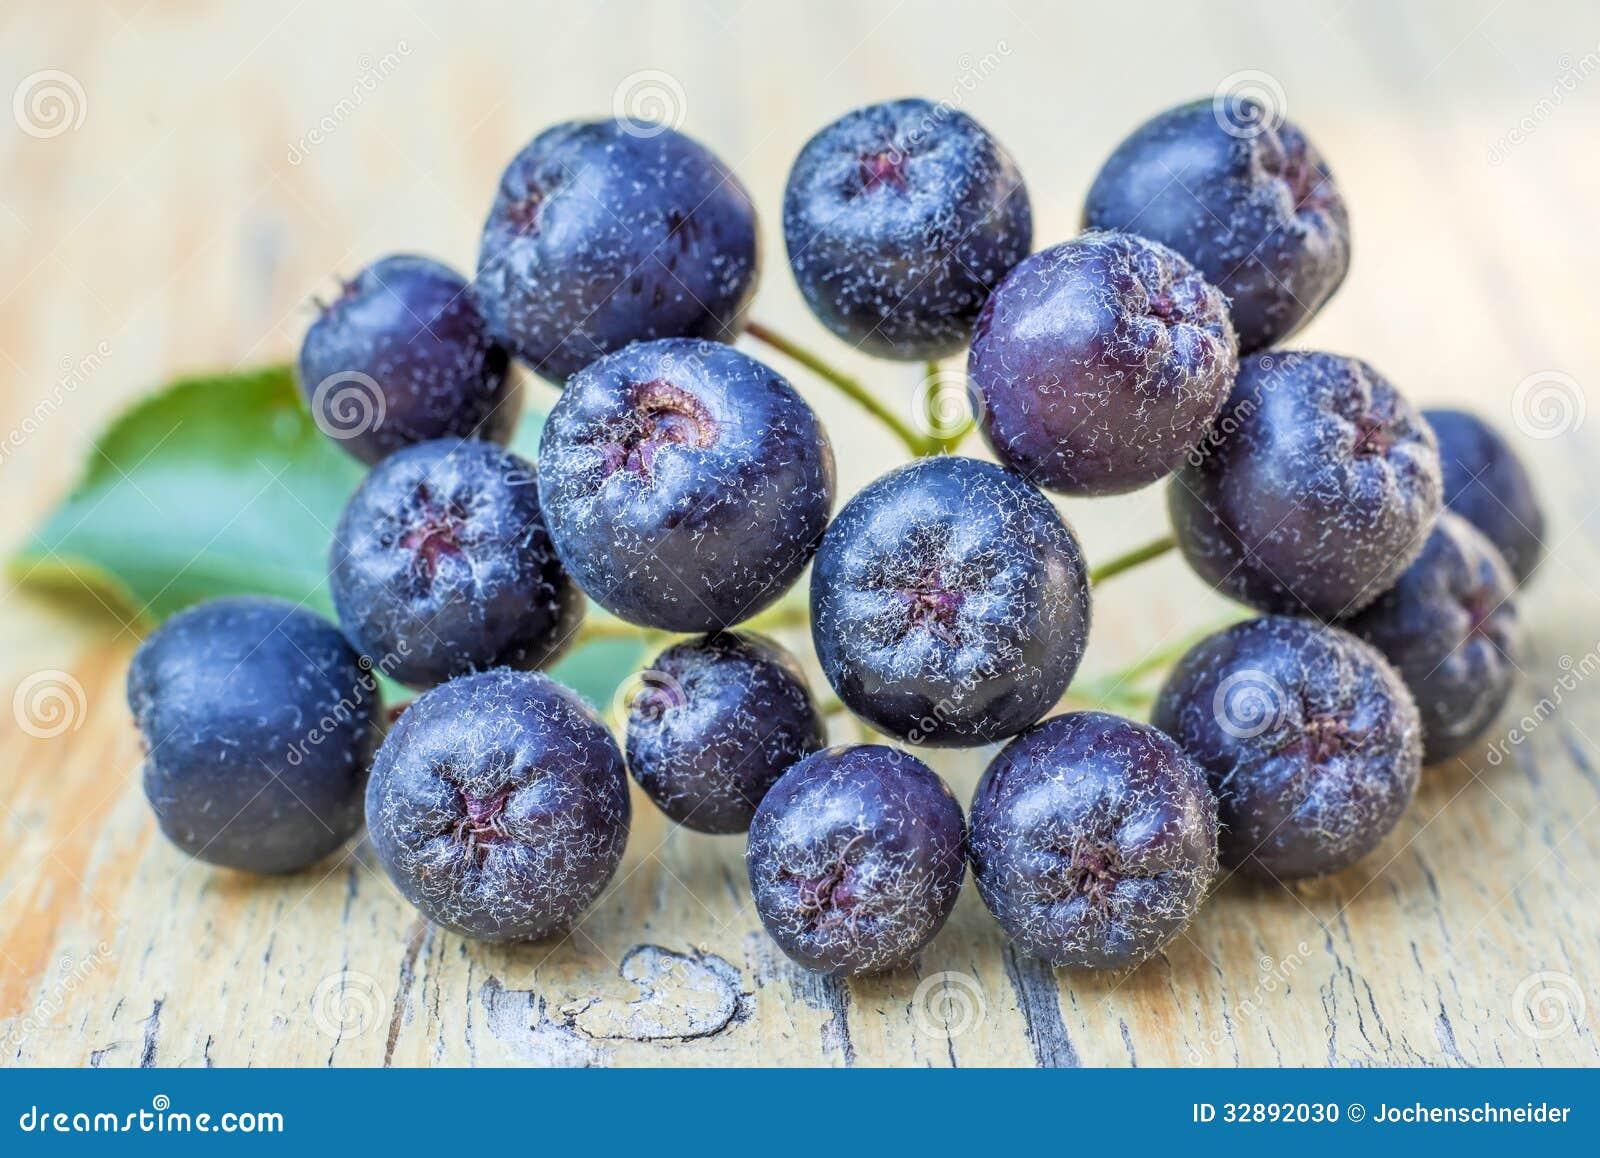 Black choke berry